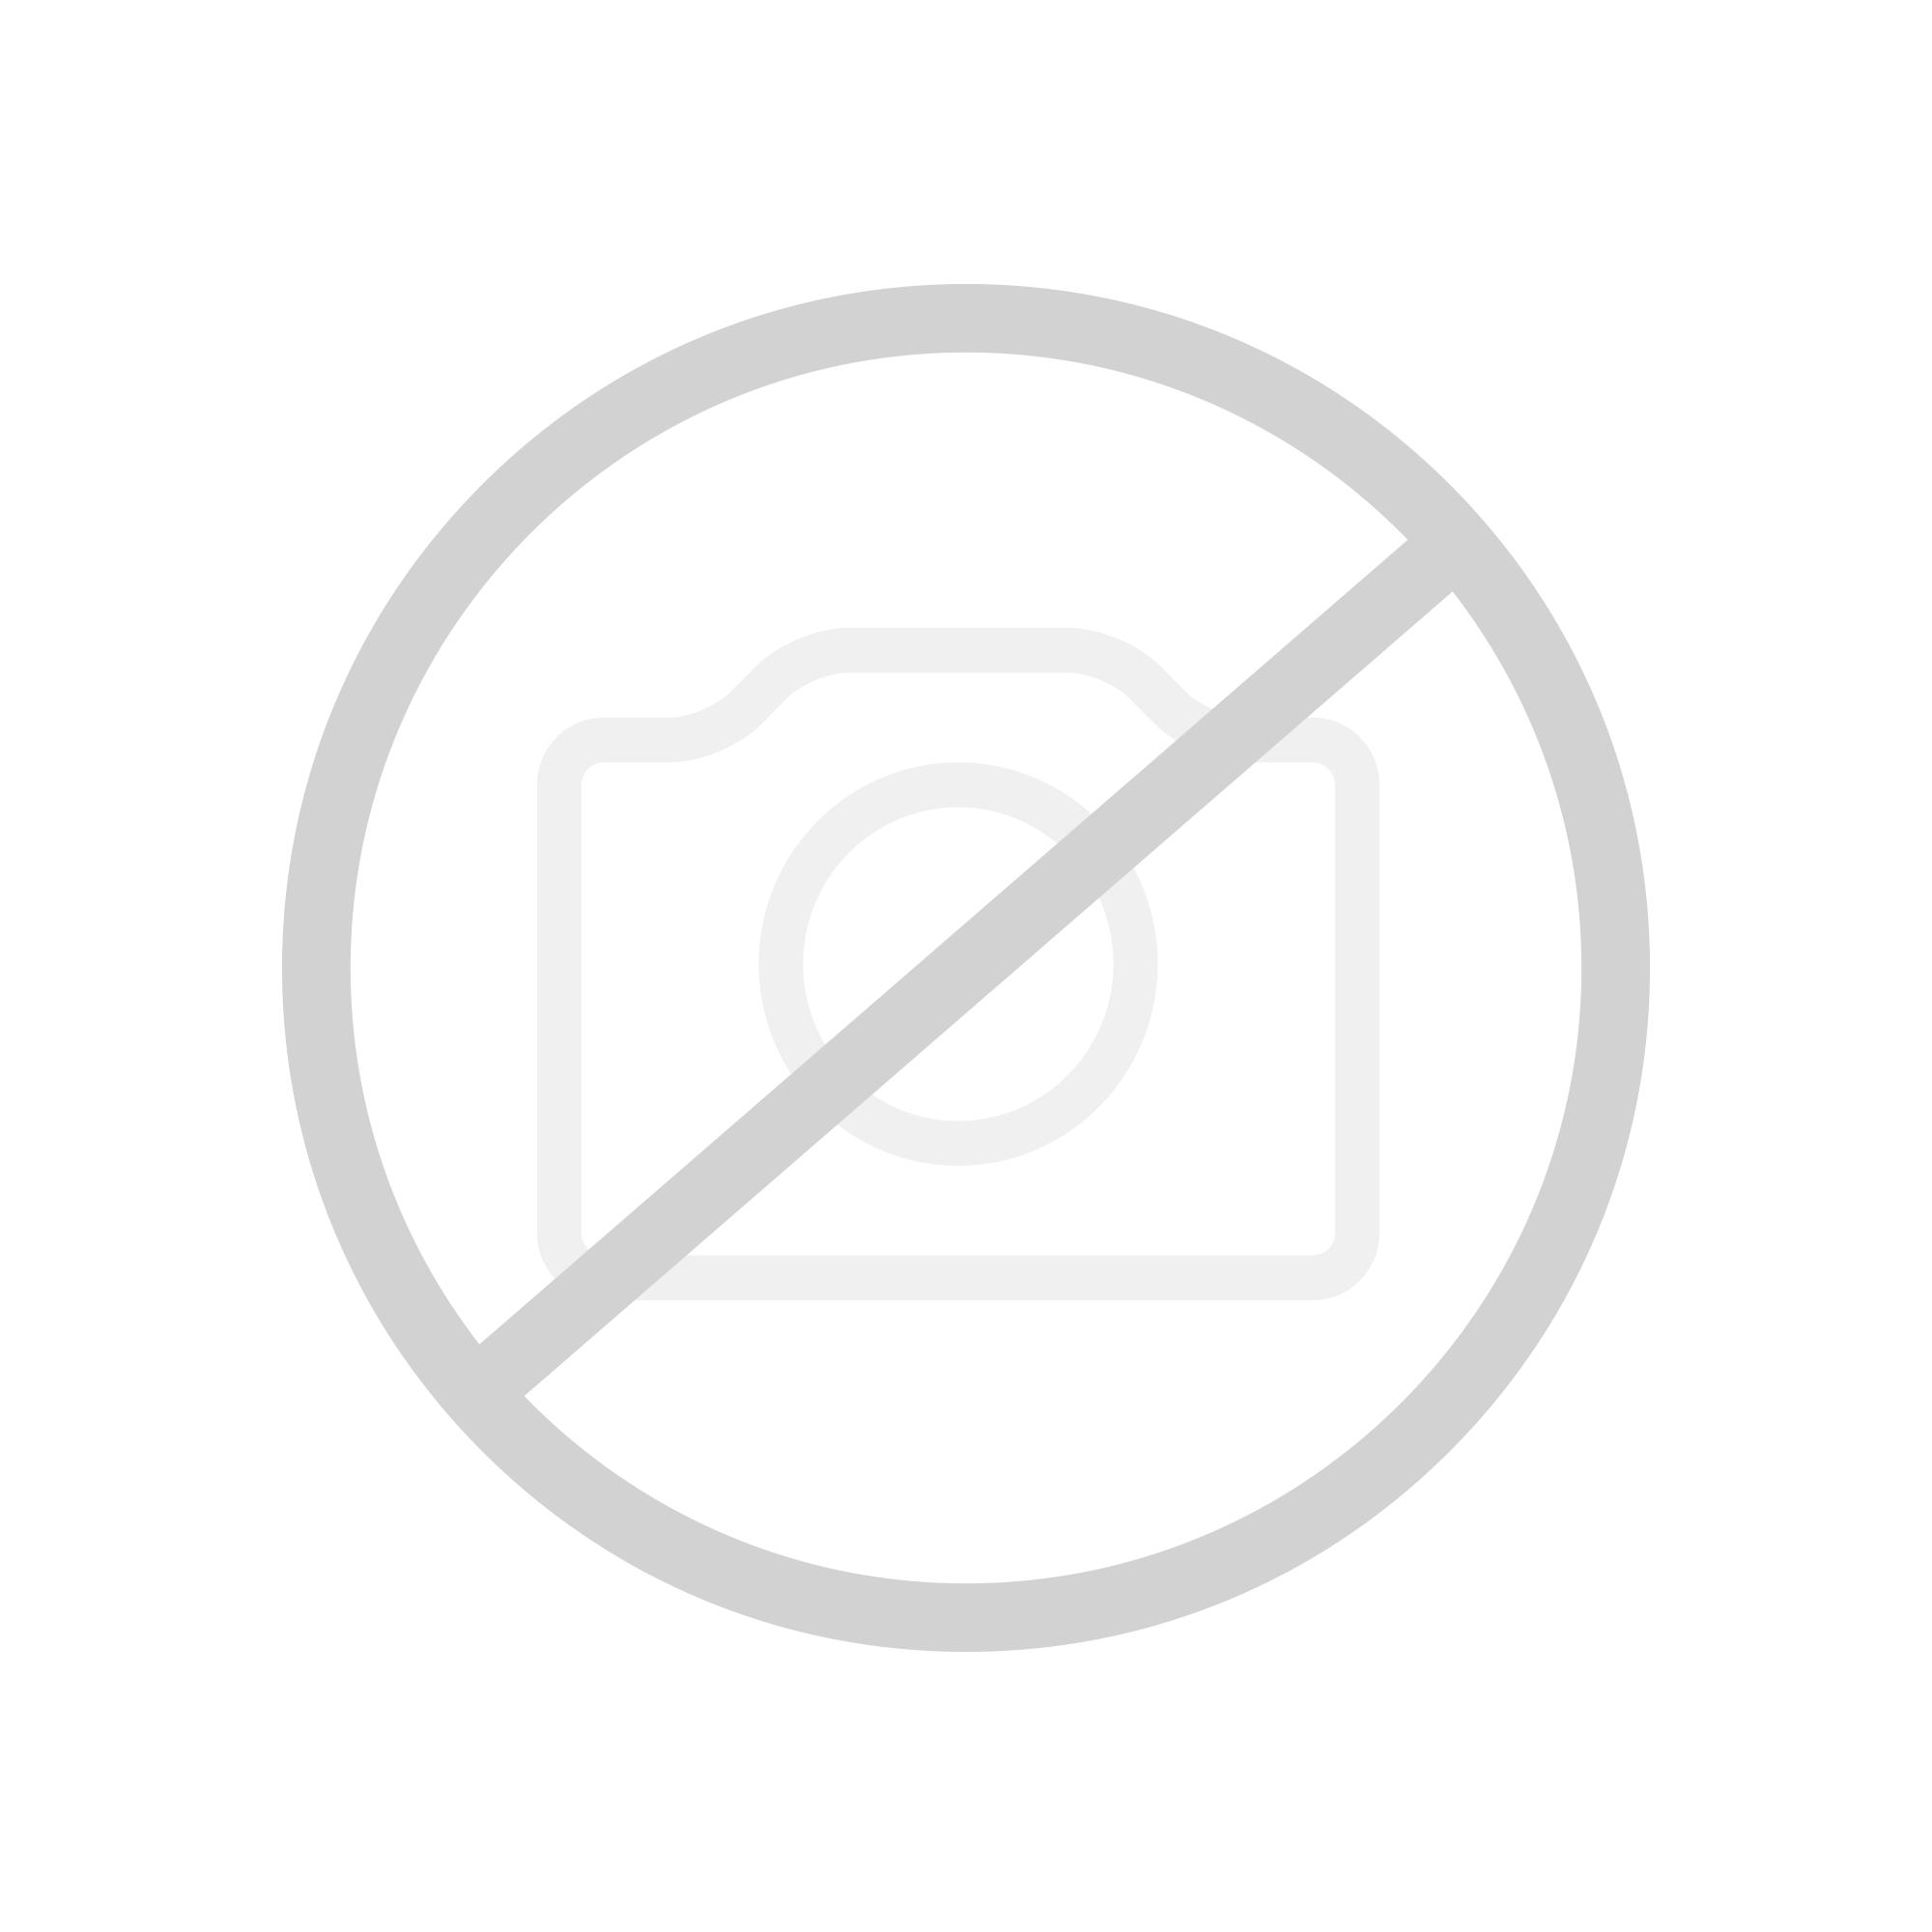 LCD 044LEDSEN Wandleuchte mit Bewegungsmelder